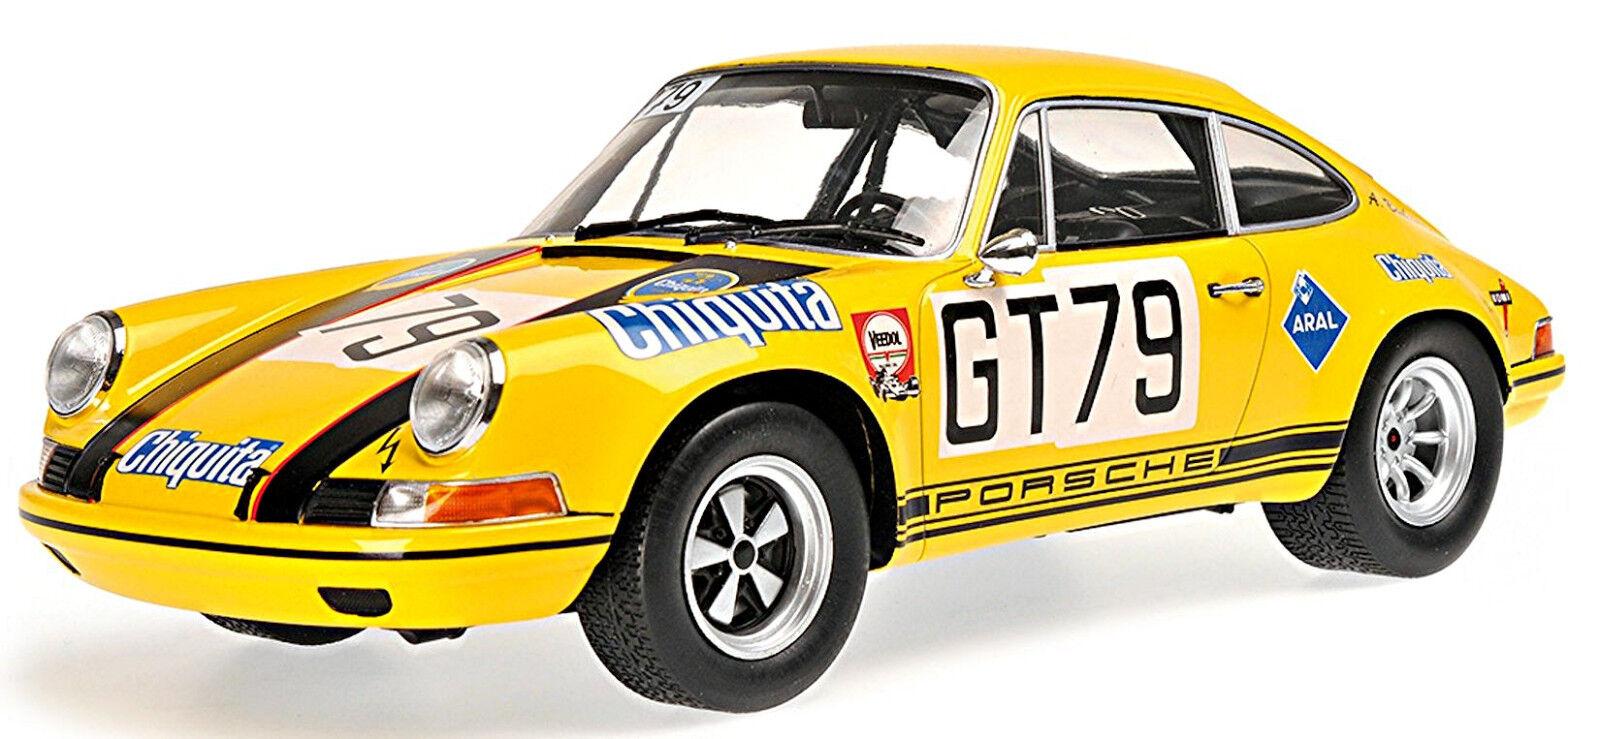 marcas de moda Porsche 911 s Racing Team AAW class class class winner 1970  79 alegre Toivonen 1 18 minic  mejor calidad